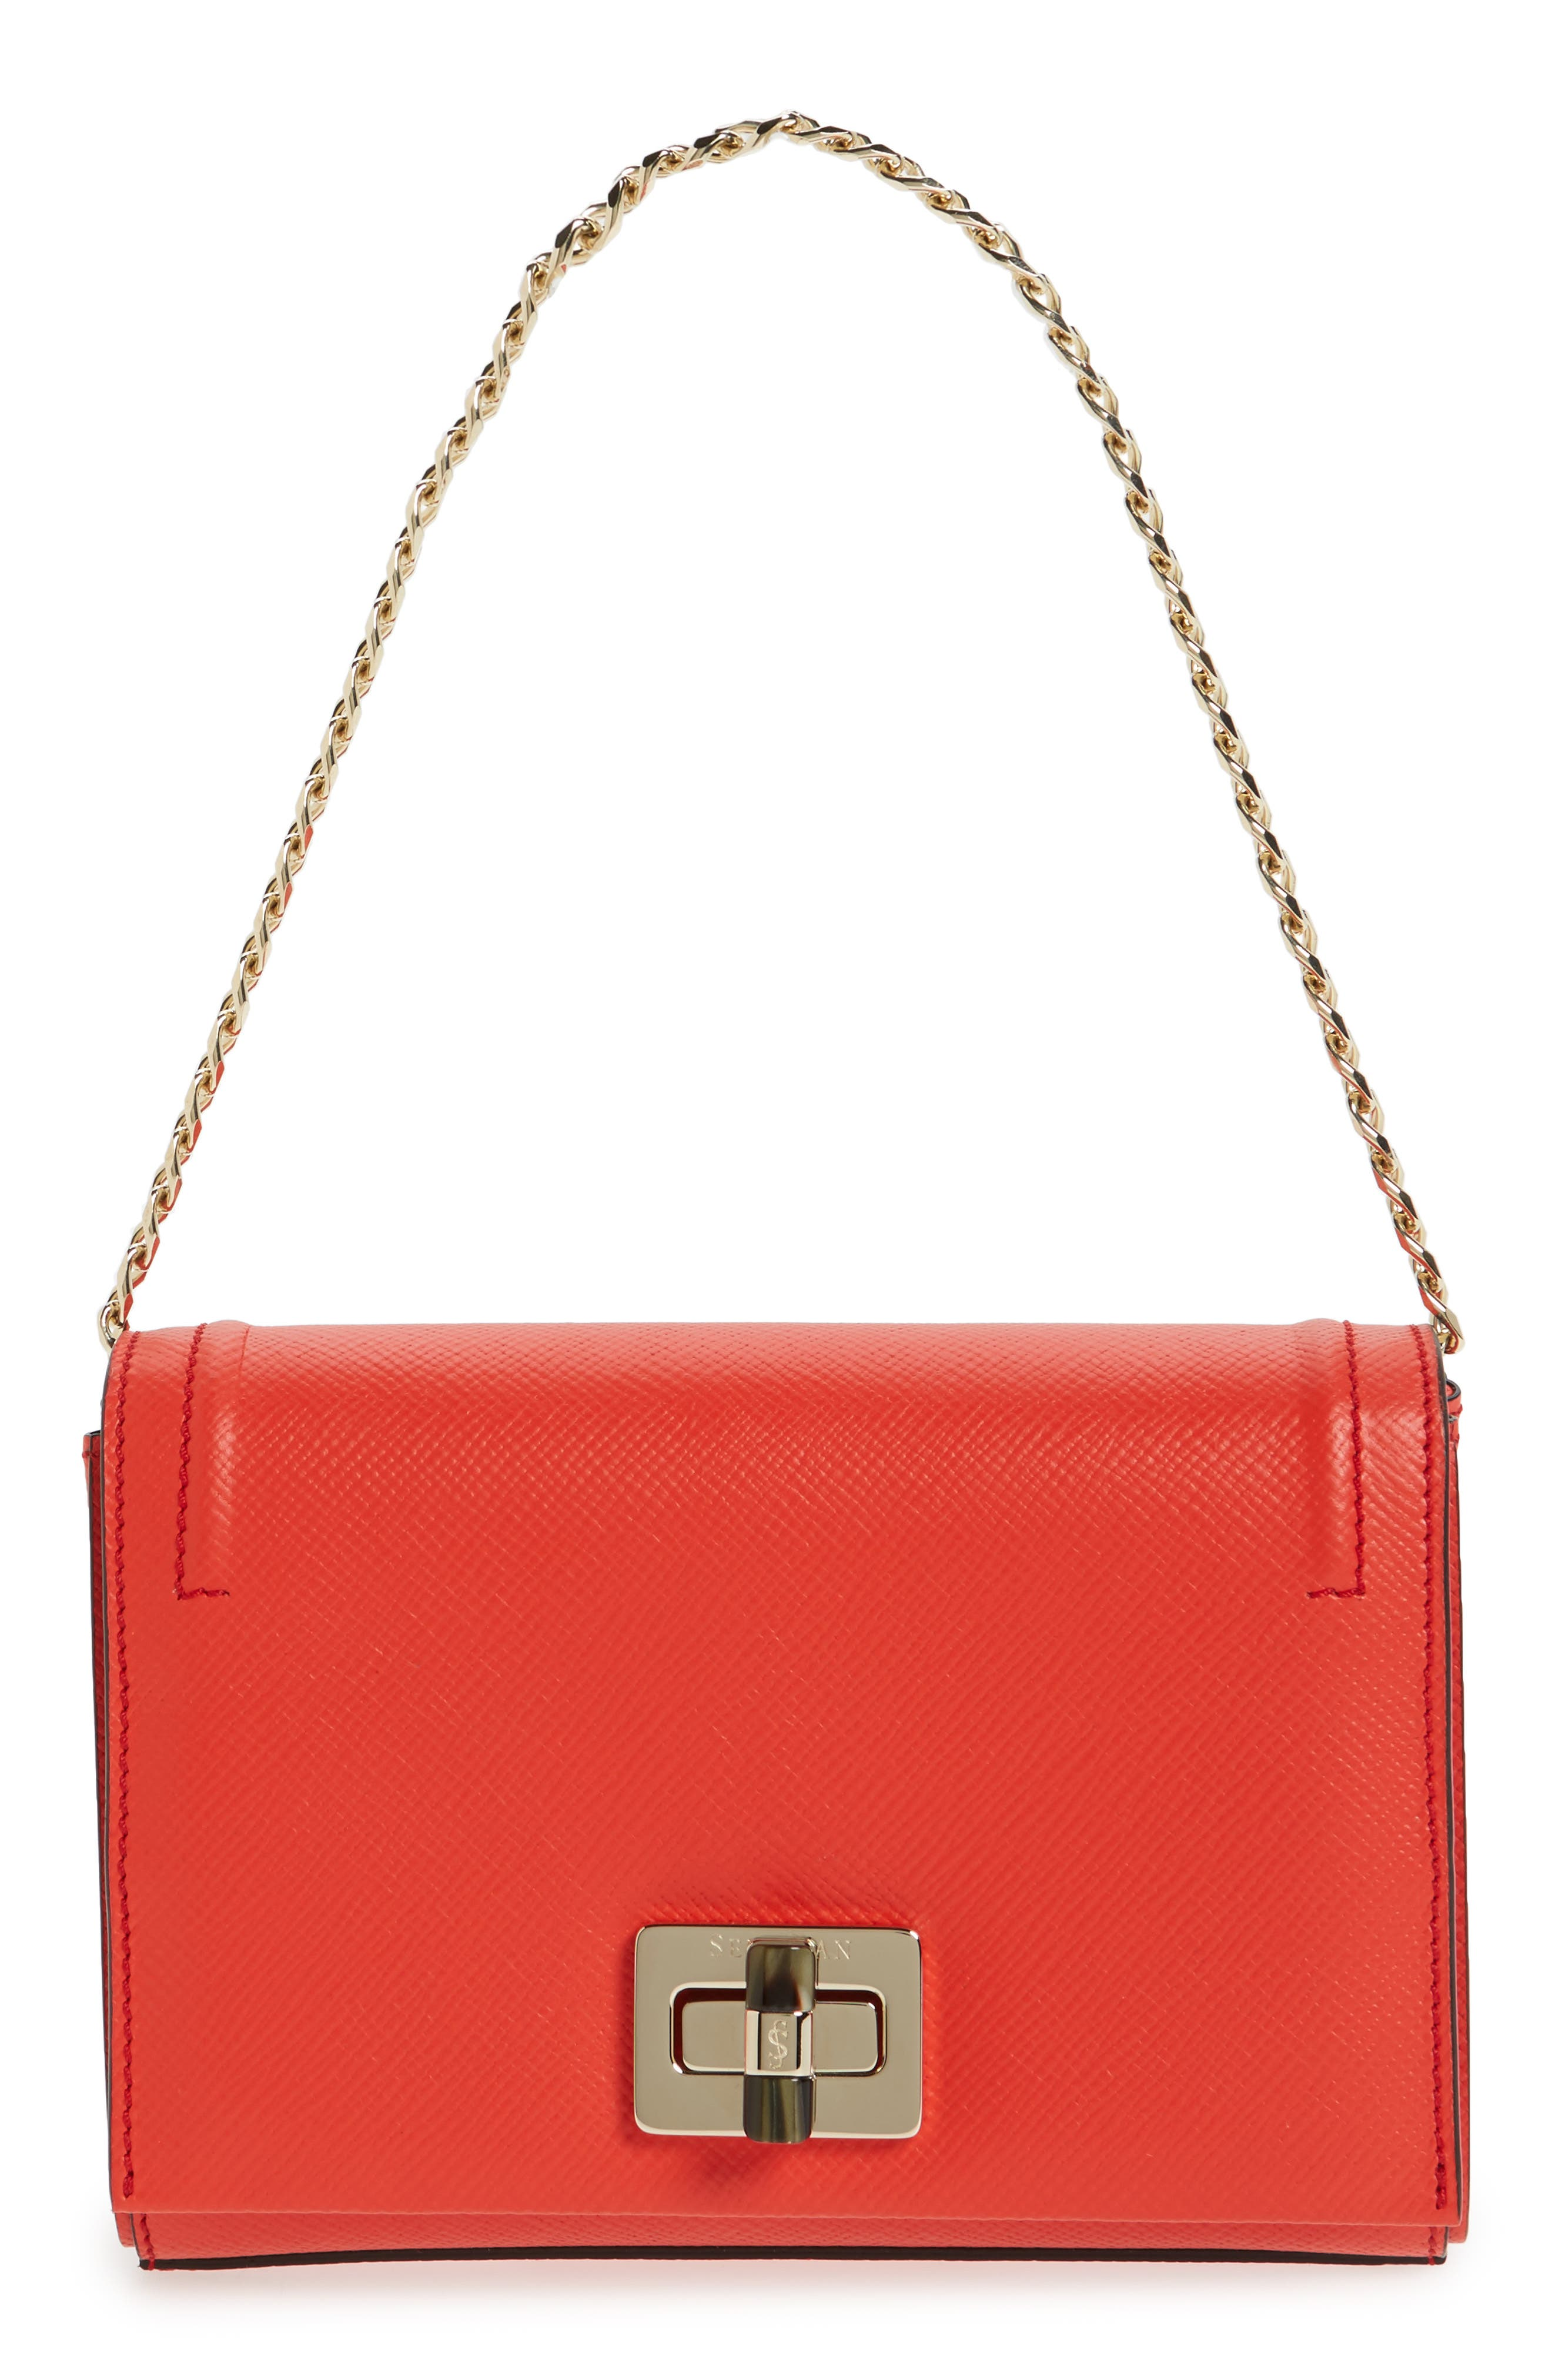 Mini Ilenea Leather Crossbody Bag,                             Alternate thumbnail 7, color,                             Coral Red